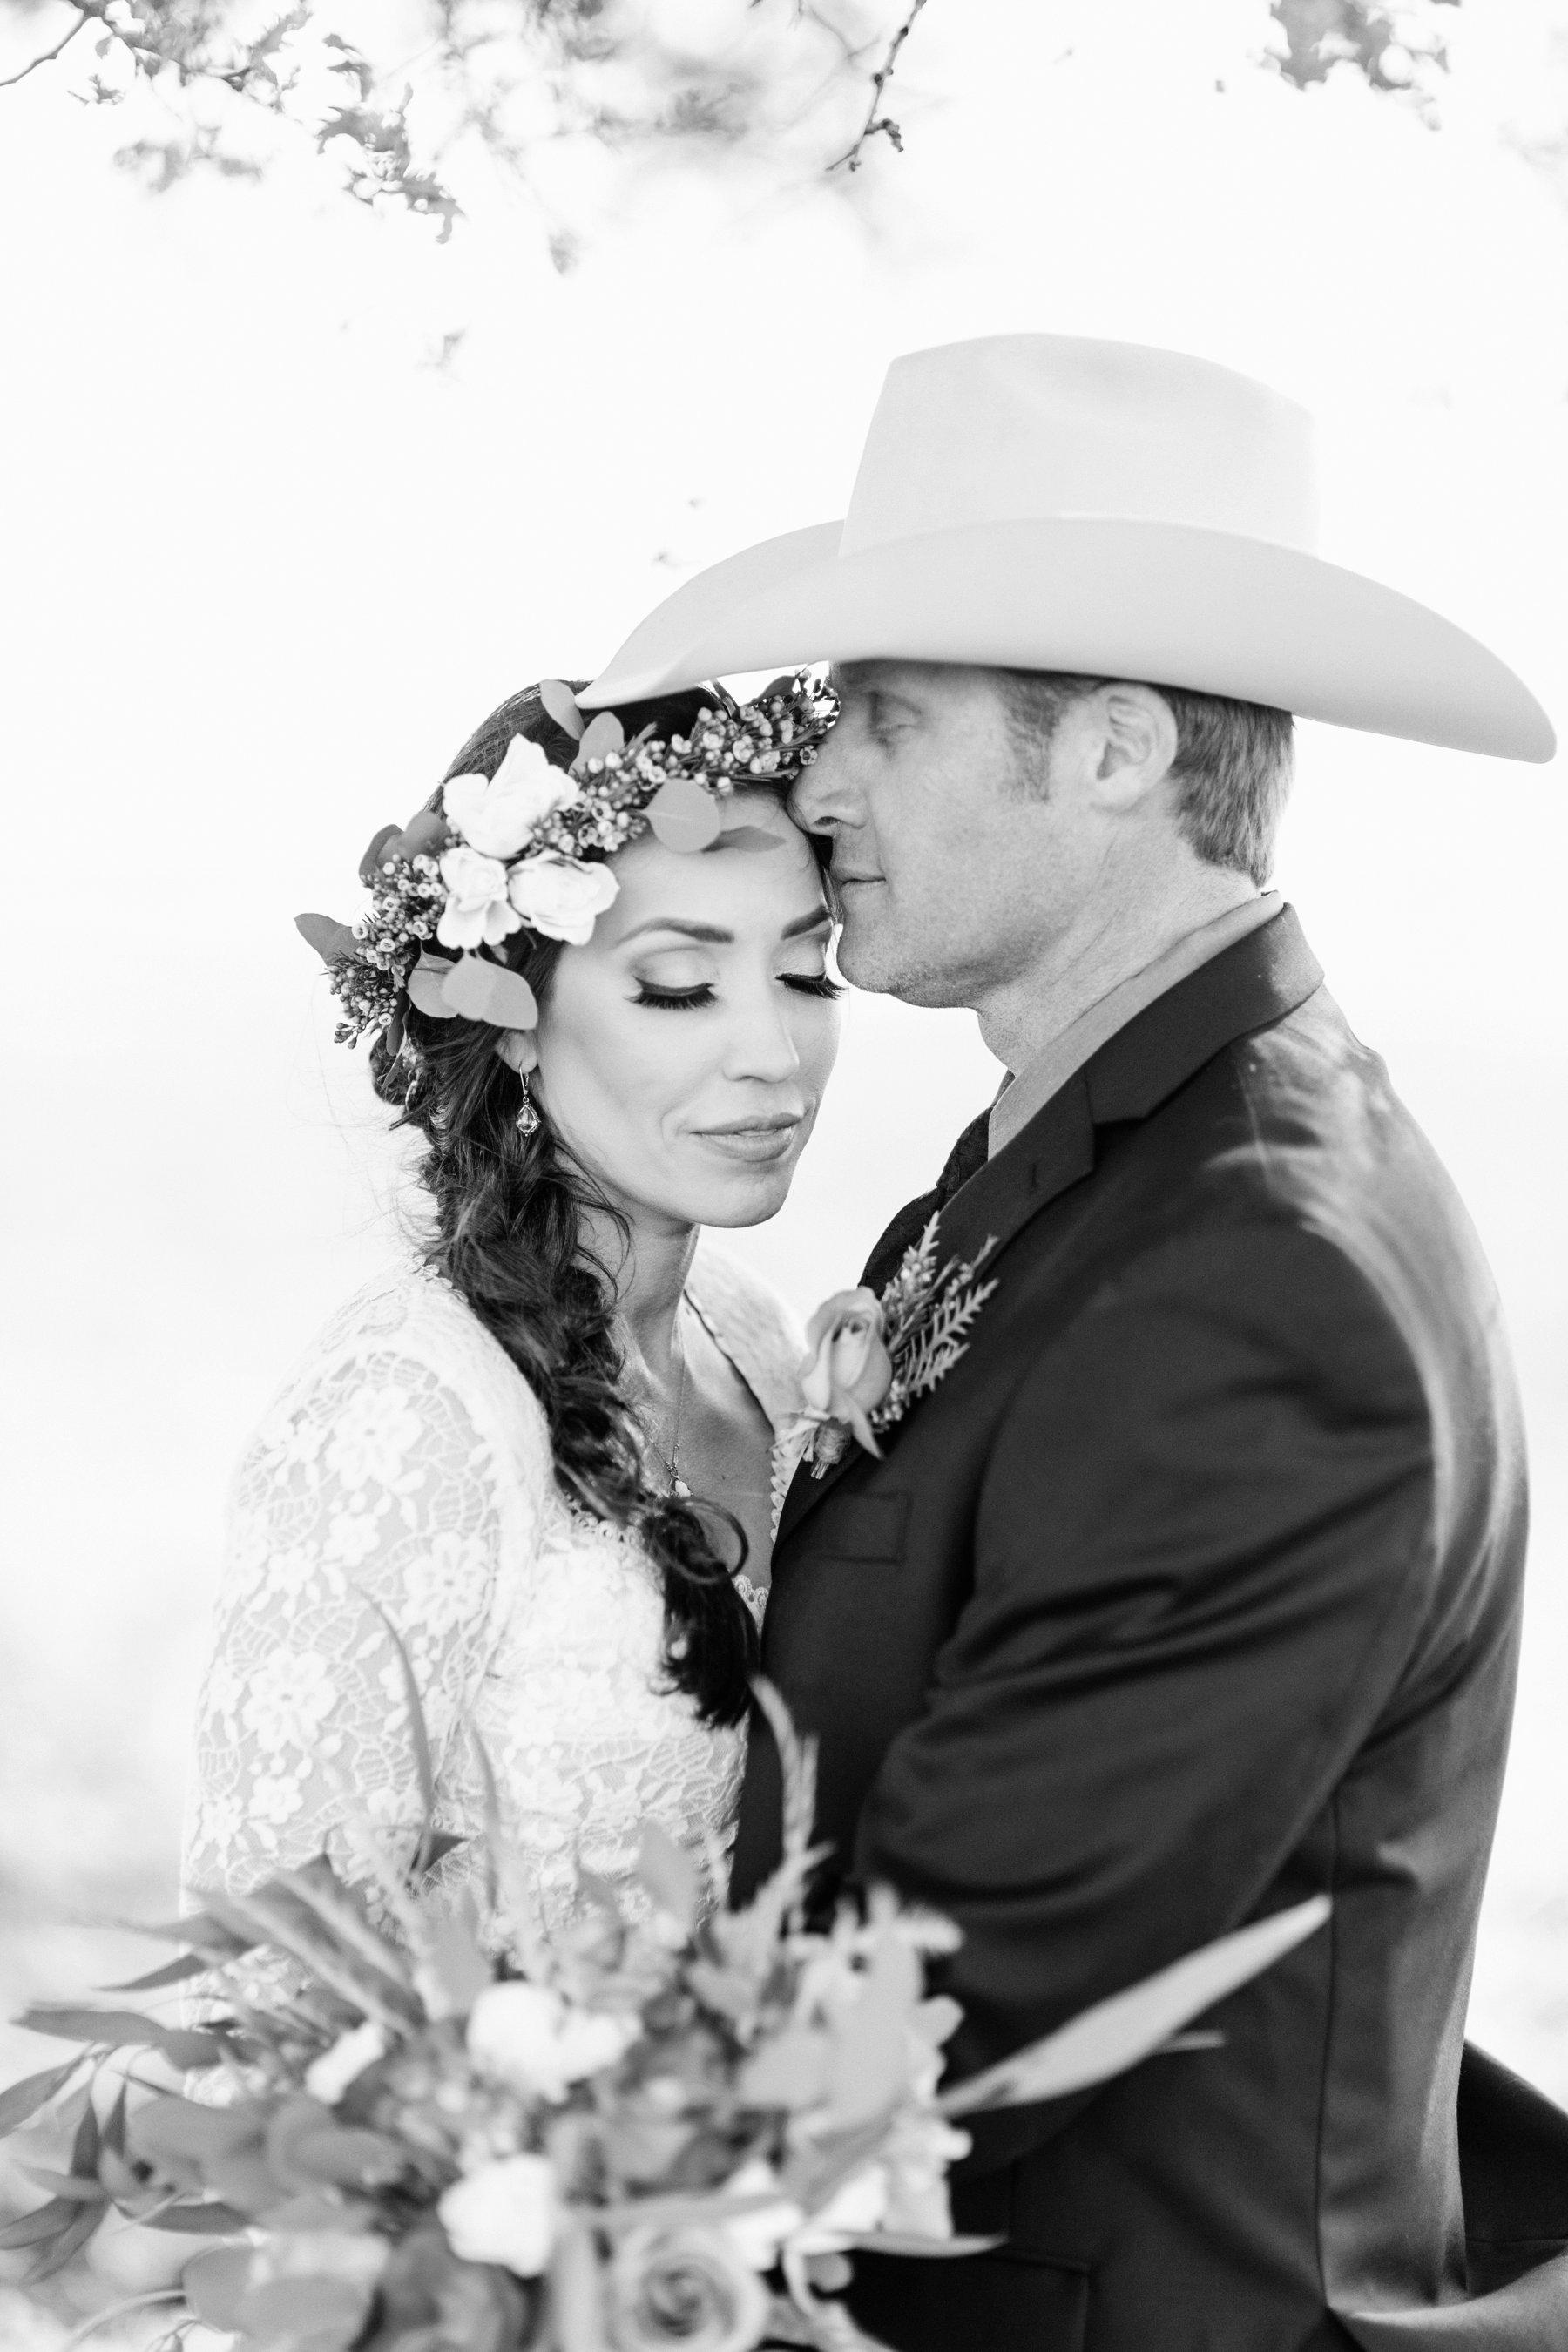 Cherokee / Oregon Gulch California // Cowboy wedding in northern california in open fields of flowers under an oak tree // Photography by Diana Elizabeth Photography www.dianaelizabeth.com